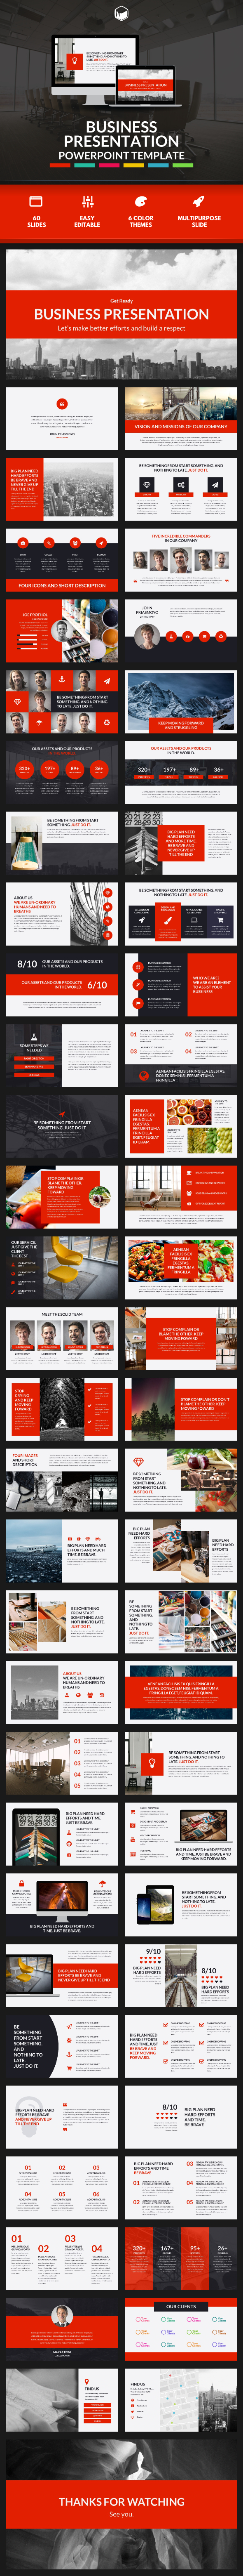 Business Presentation 2 - PowerPoint Template - Business PowerPoint Templates